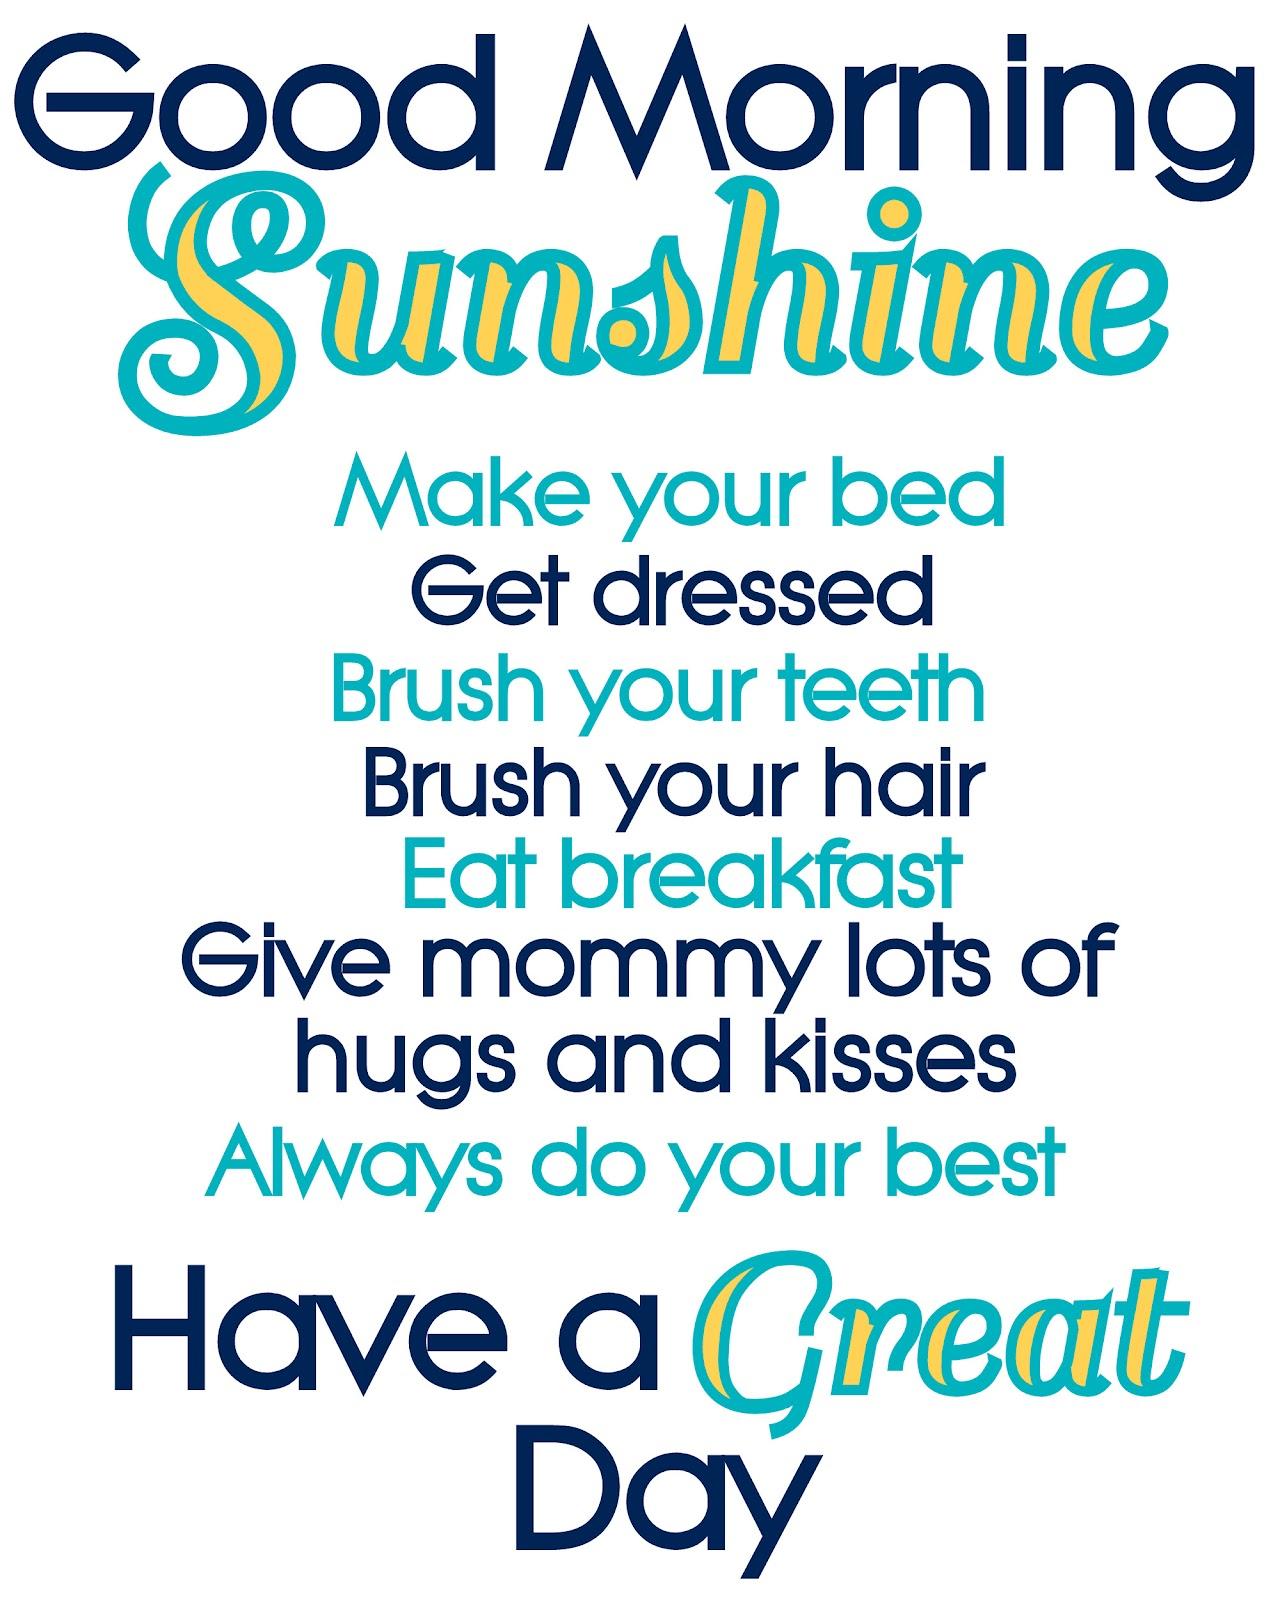 Good Morning Sunshine Lyric : The accidental baby maker making a rental home